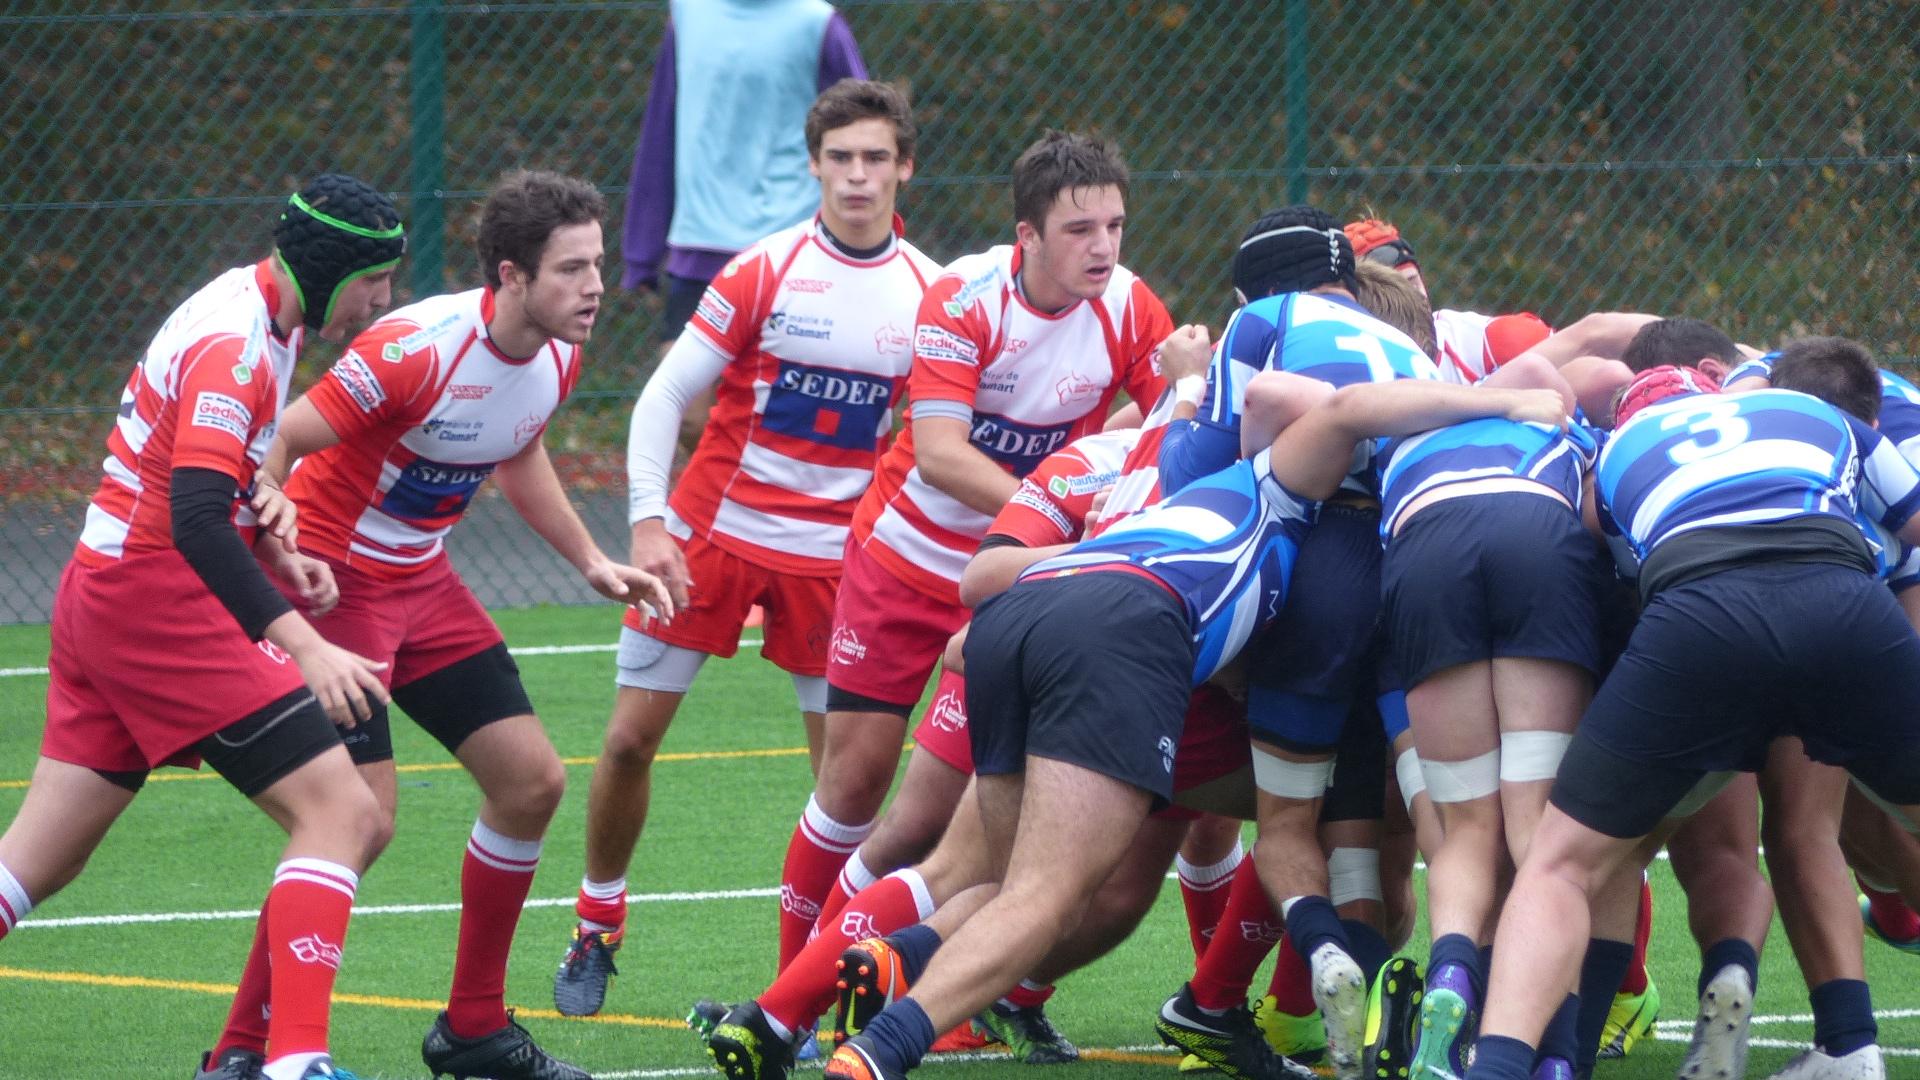 Clamart Rugby 92 - Premier match des Juniors en Balandrade-5